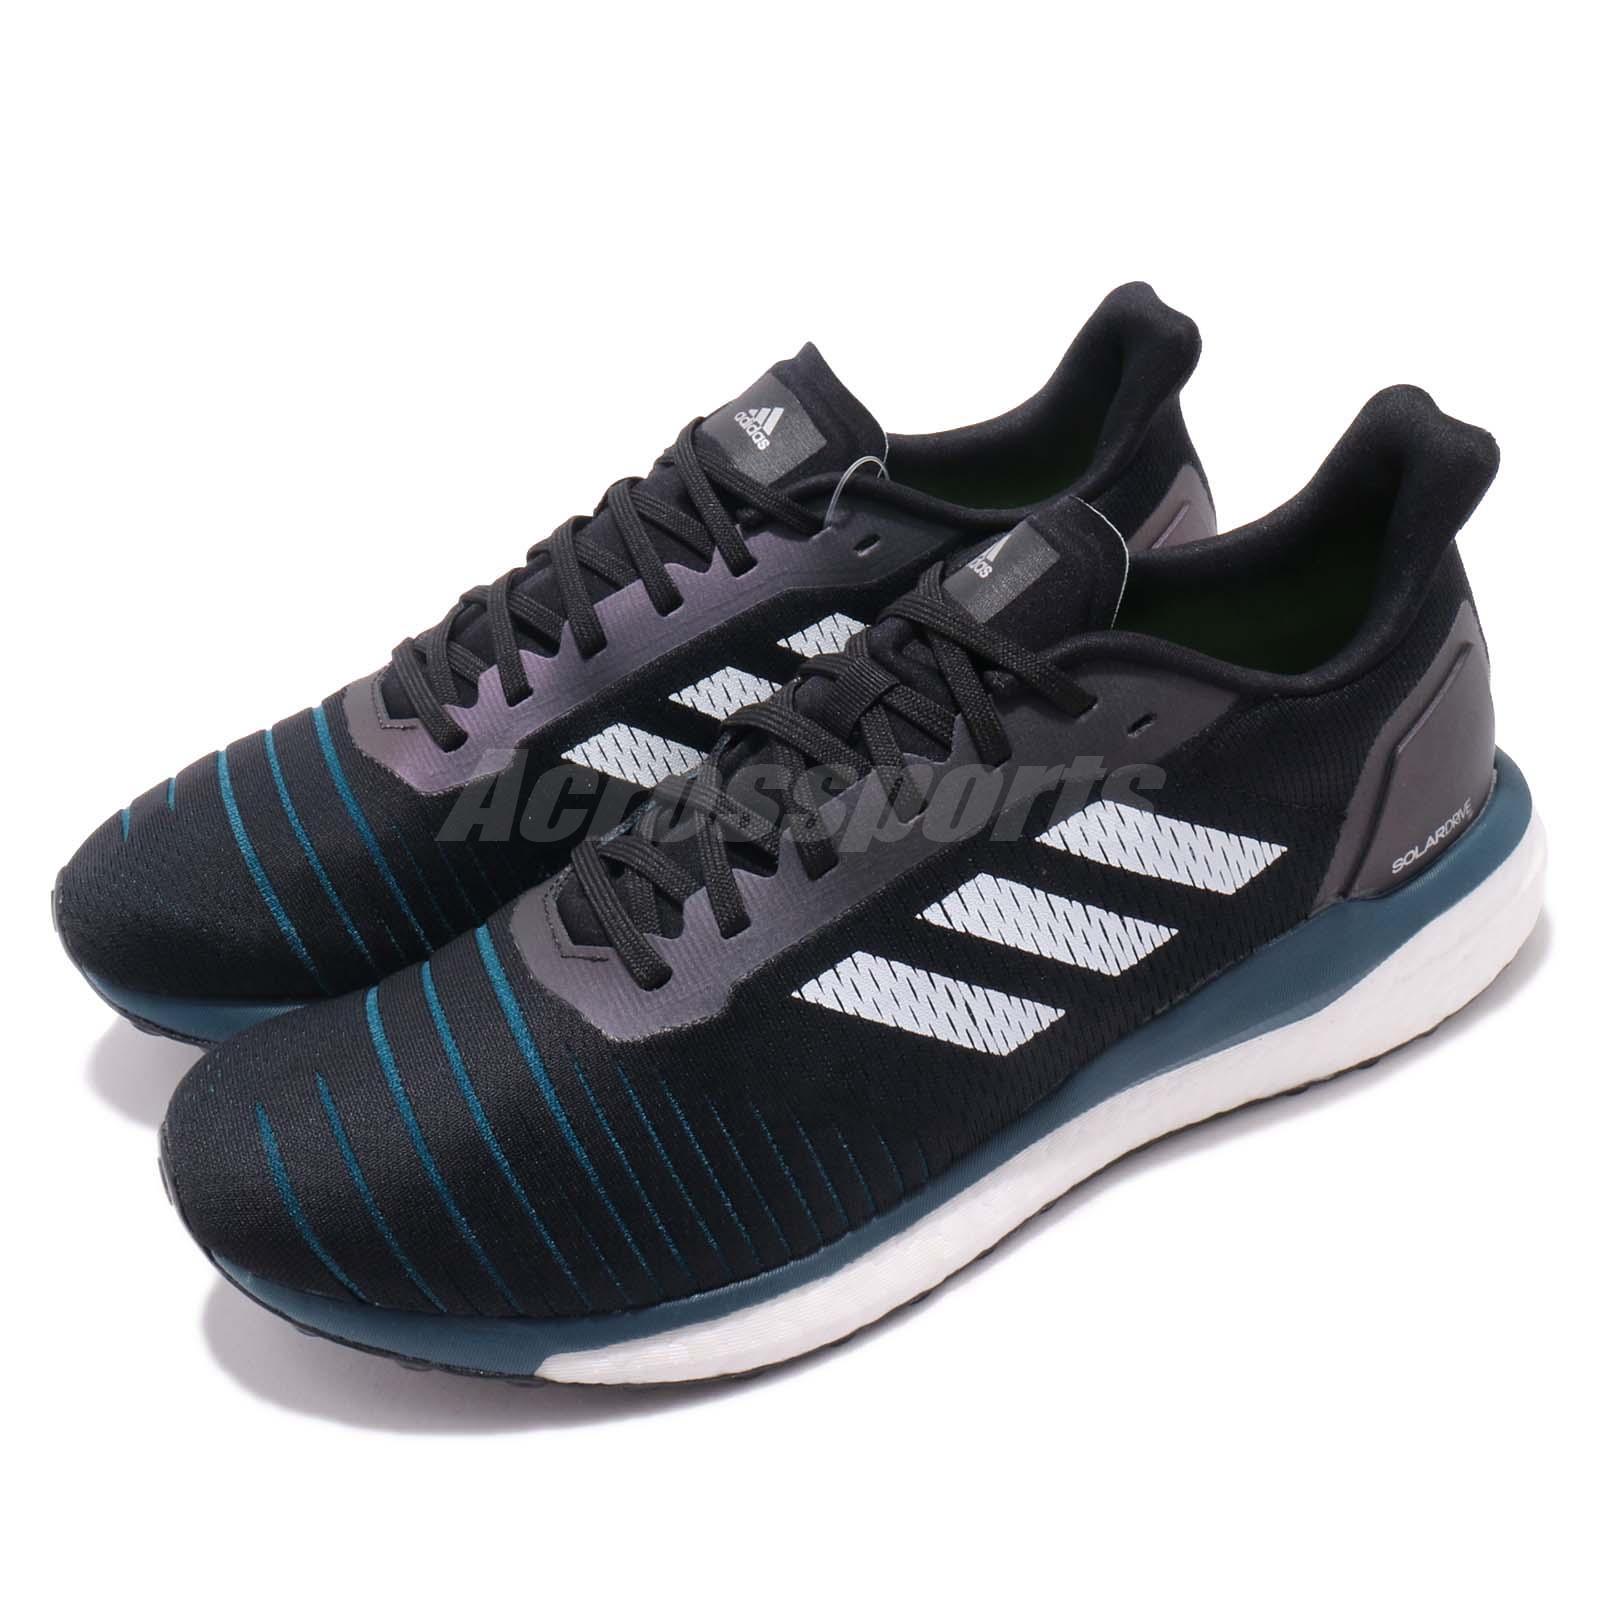 evidenziare vario Viaggiatore  adidas Solar Drive M Black White Legend Marine Men Running Shoes Sneakers  D97442   eBay